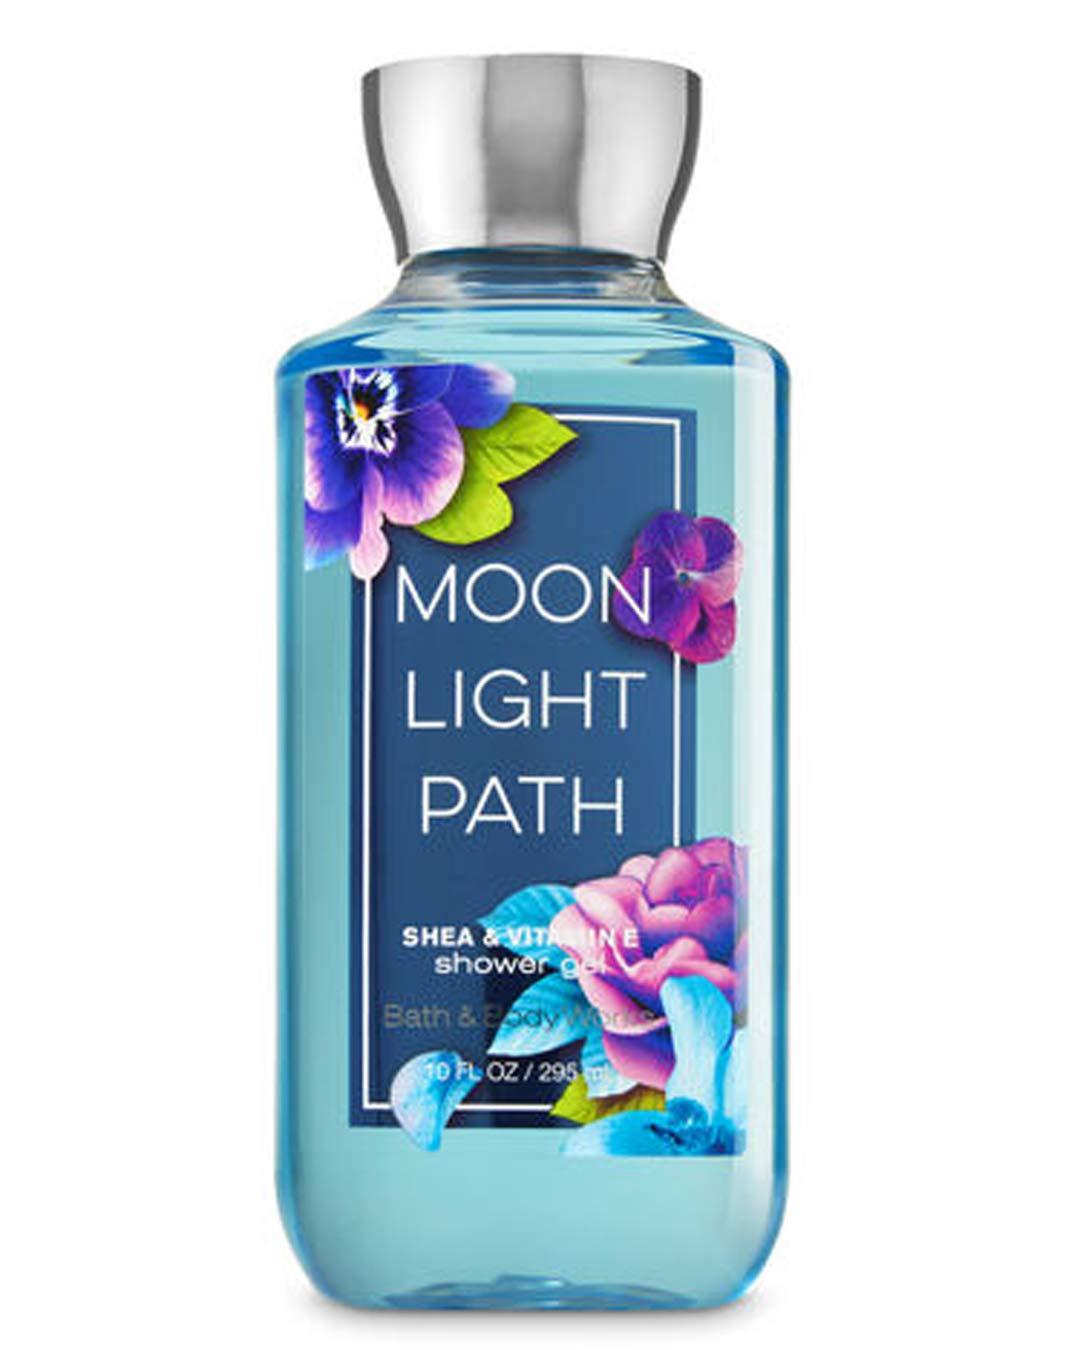 Bath & Body Works Moonlight Path Shower Gel For Women, 295